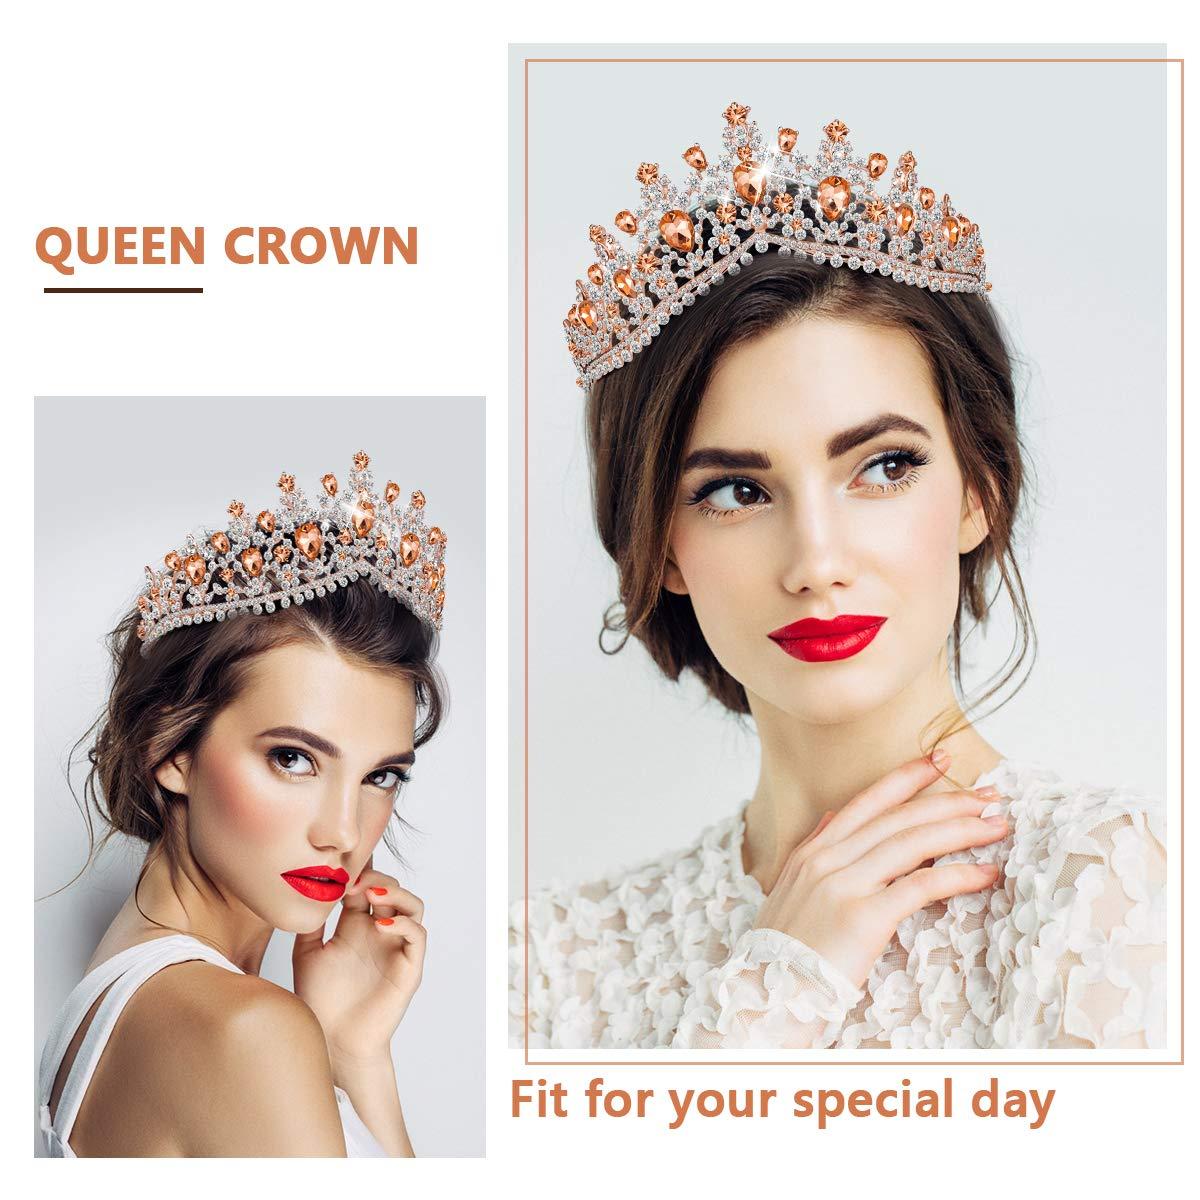 Wedding Crowns with Crystal & Side Combs, Wedding Tiara Princess Crown Headbands (Rose Gold)